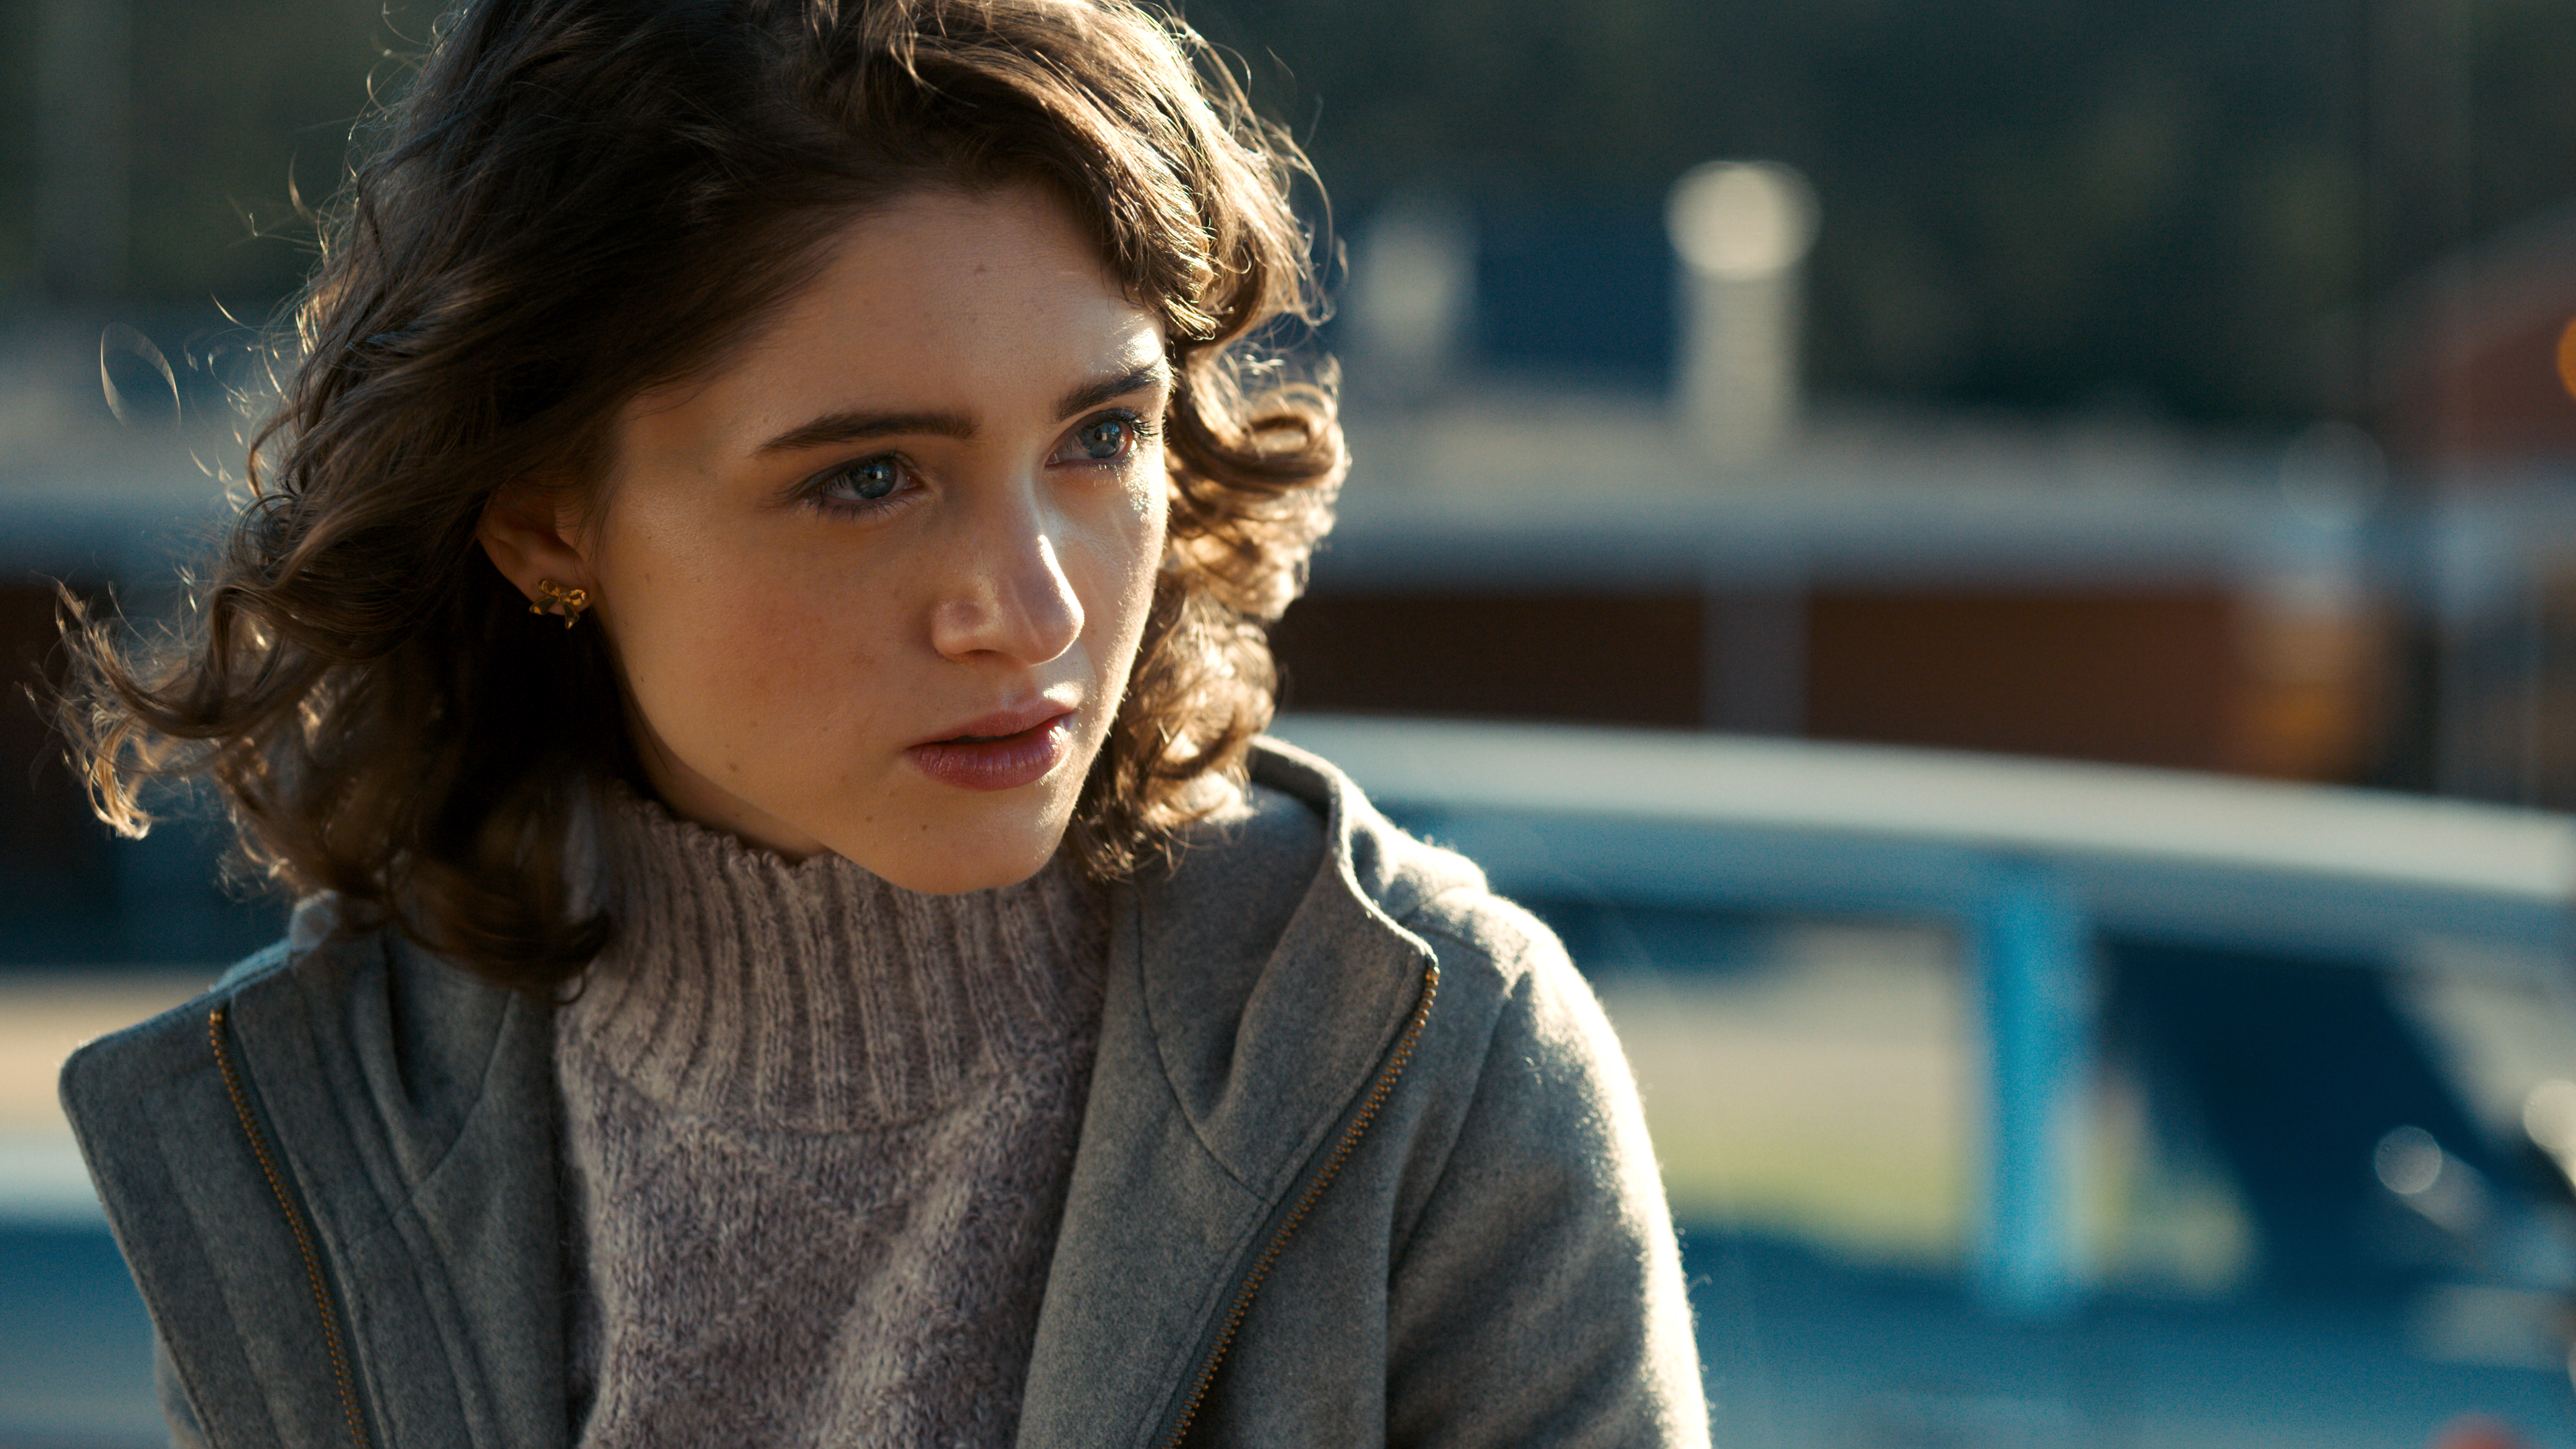 Natalia Dyer As Nancy Stranger Things Season 2 8k Hd Tv